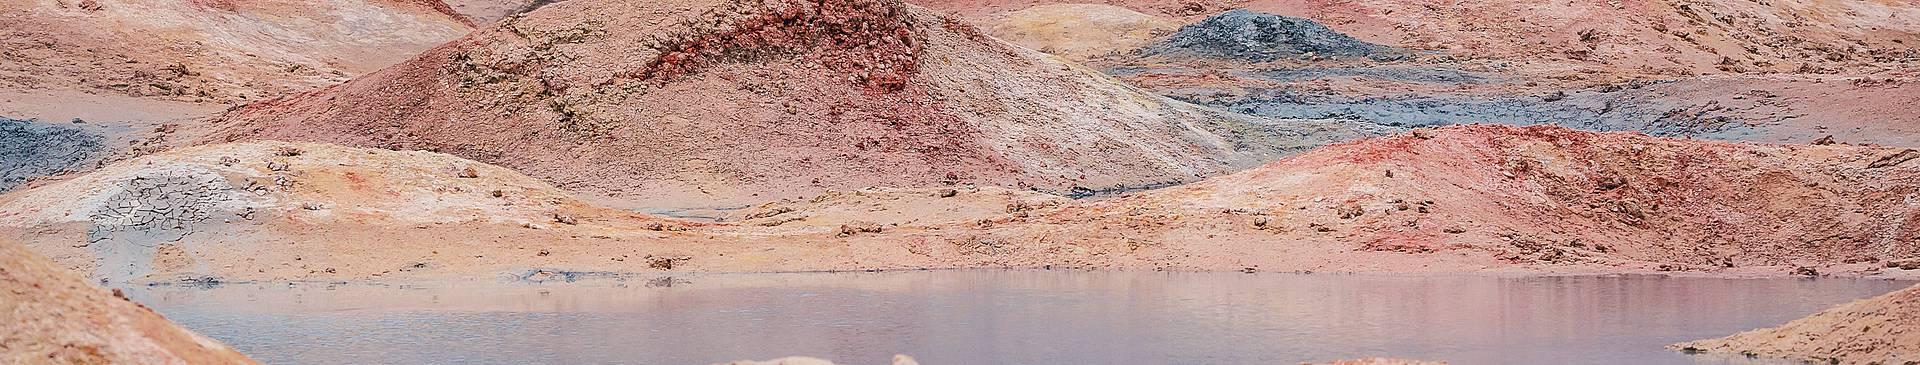 Bolivia off-the-beaten-track